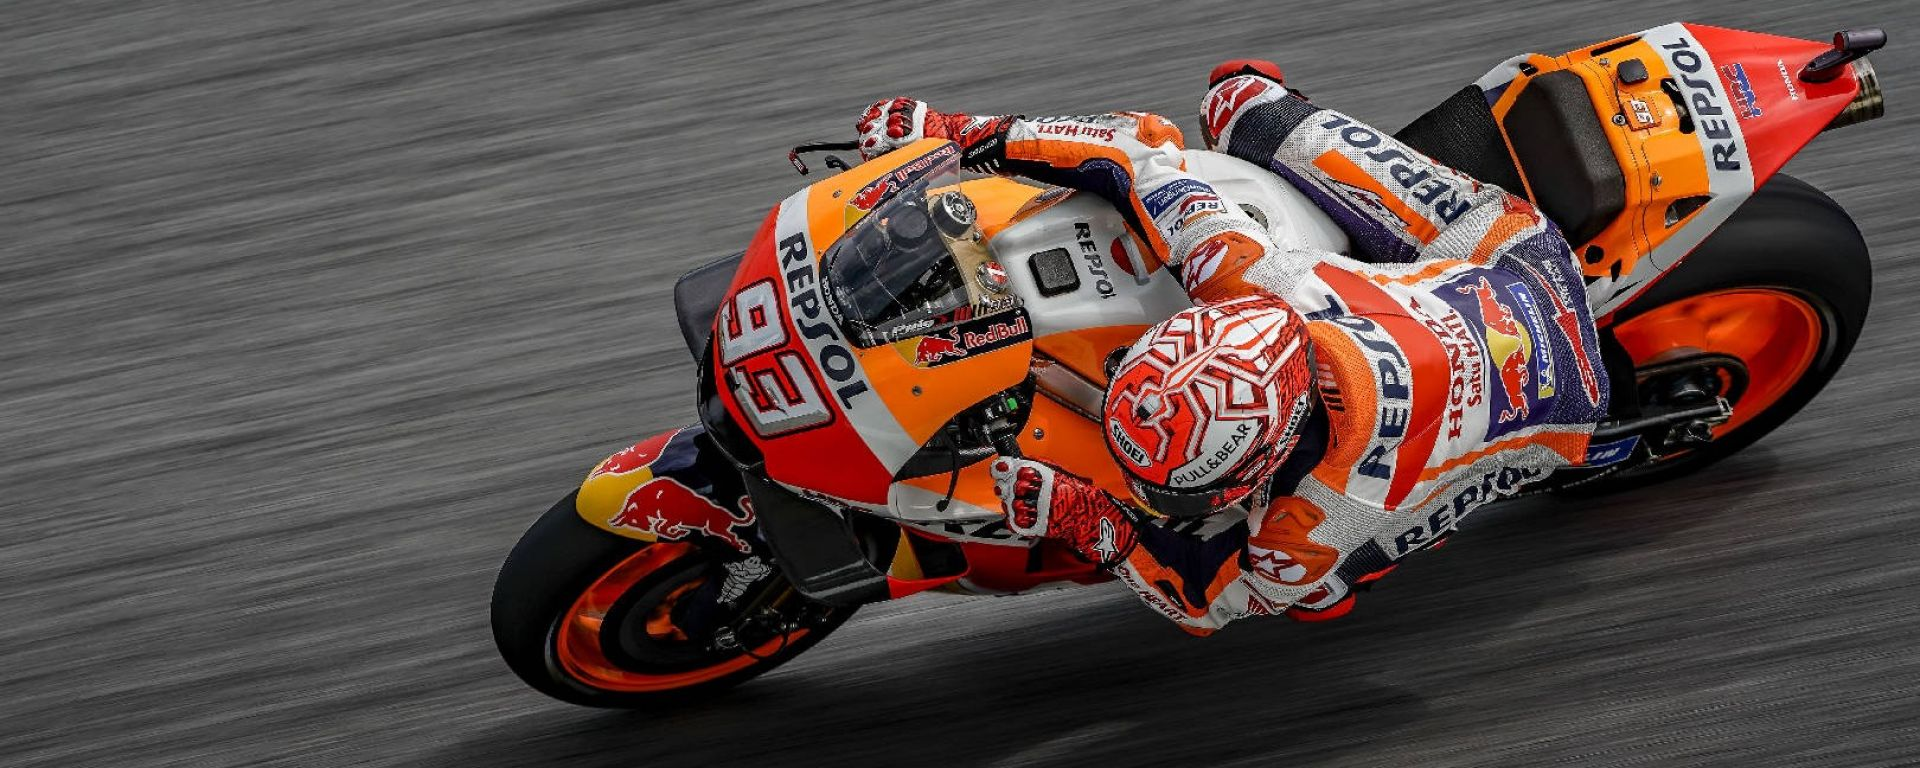 MotoGP Sepang 2018: Marquez in pole, cambiano gli orari gara